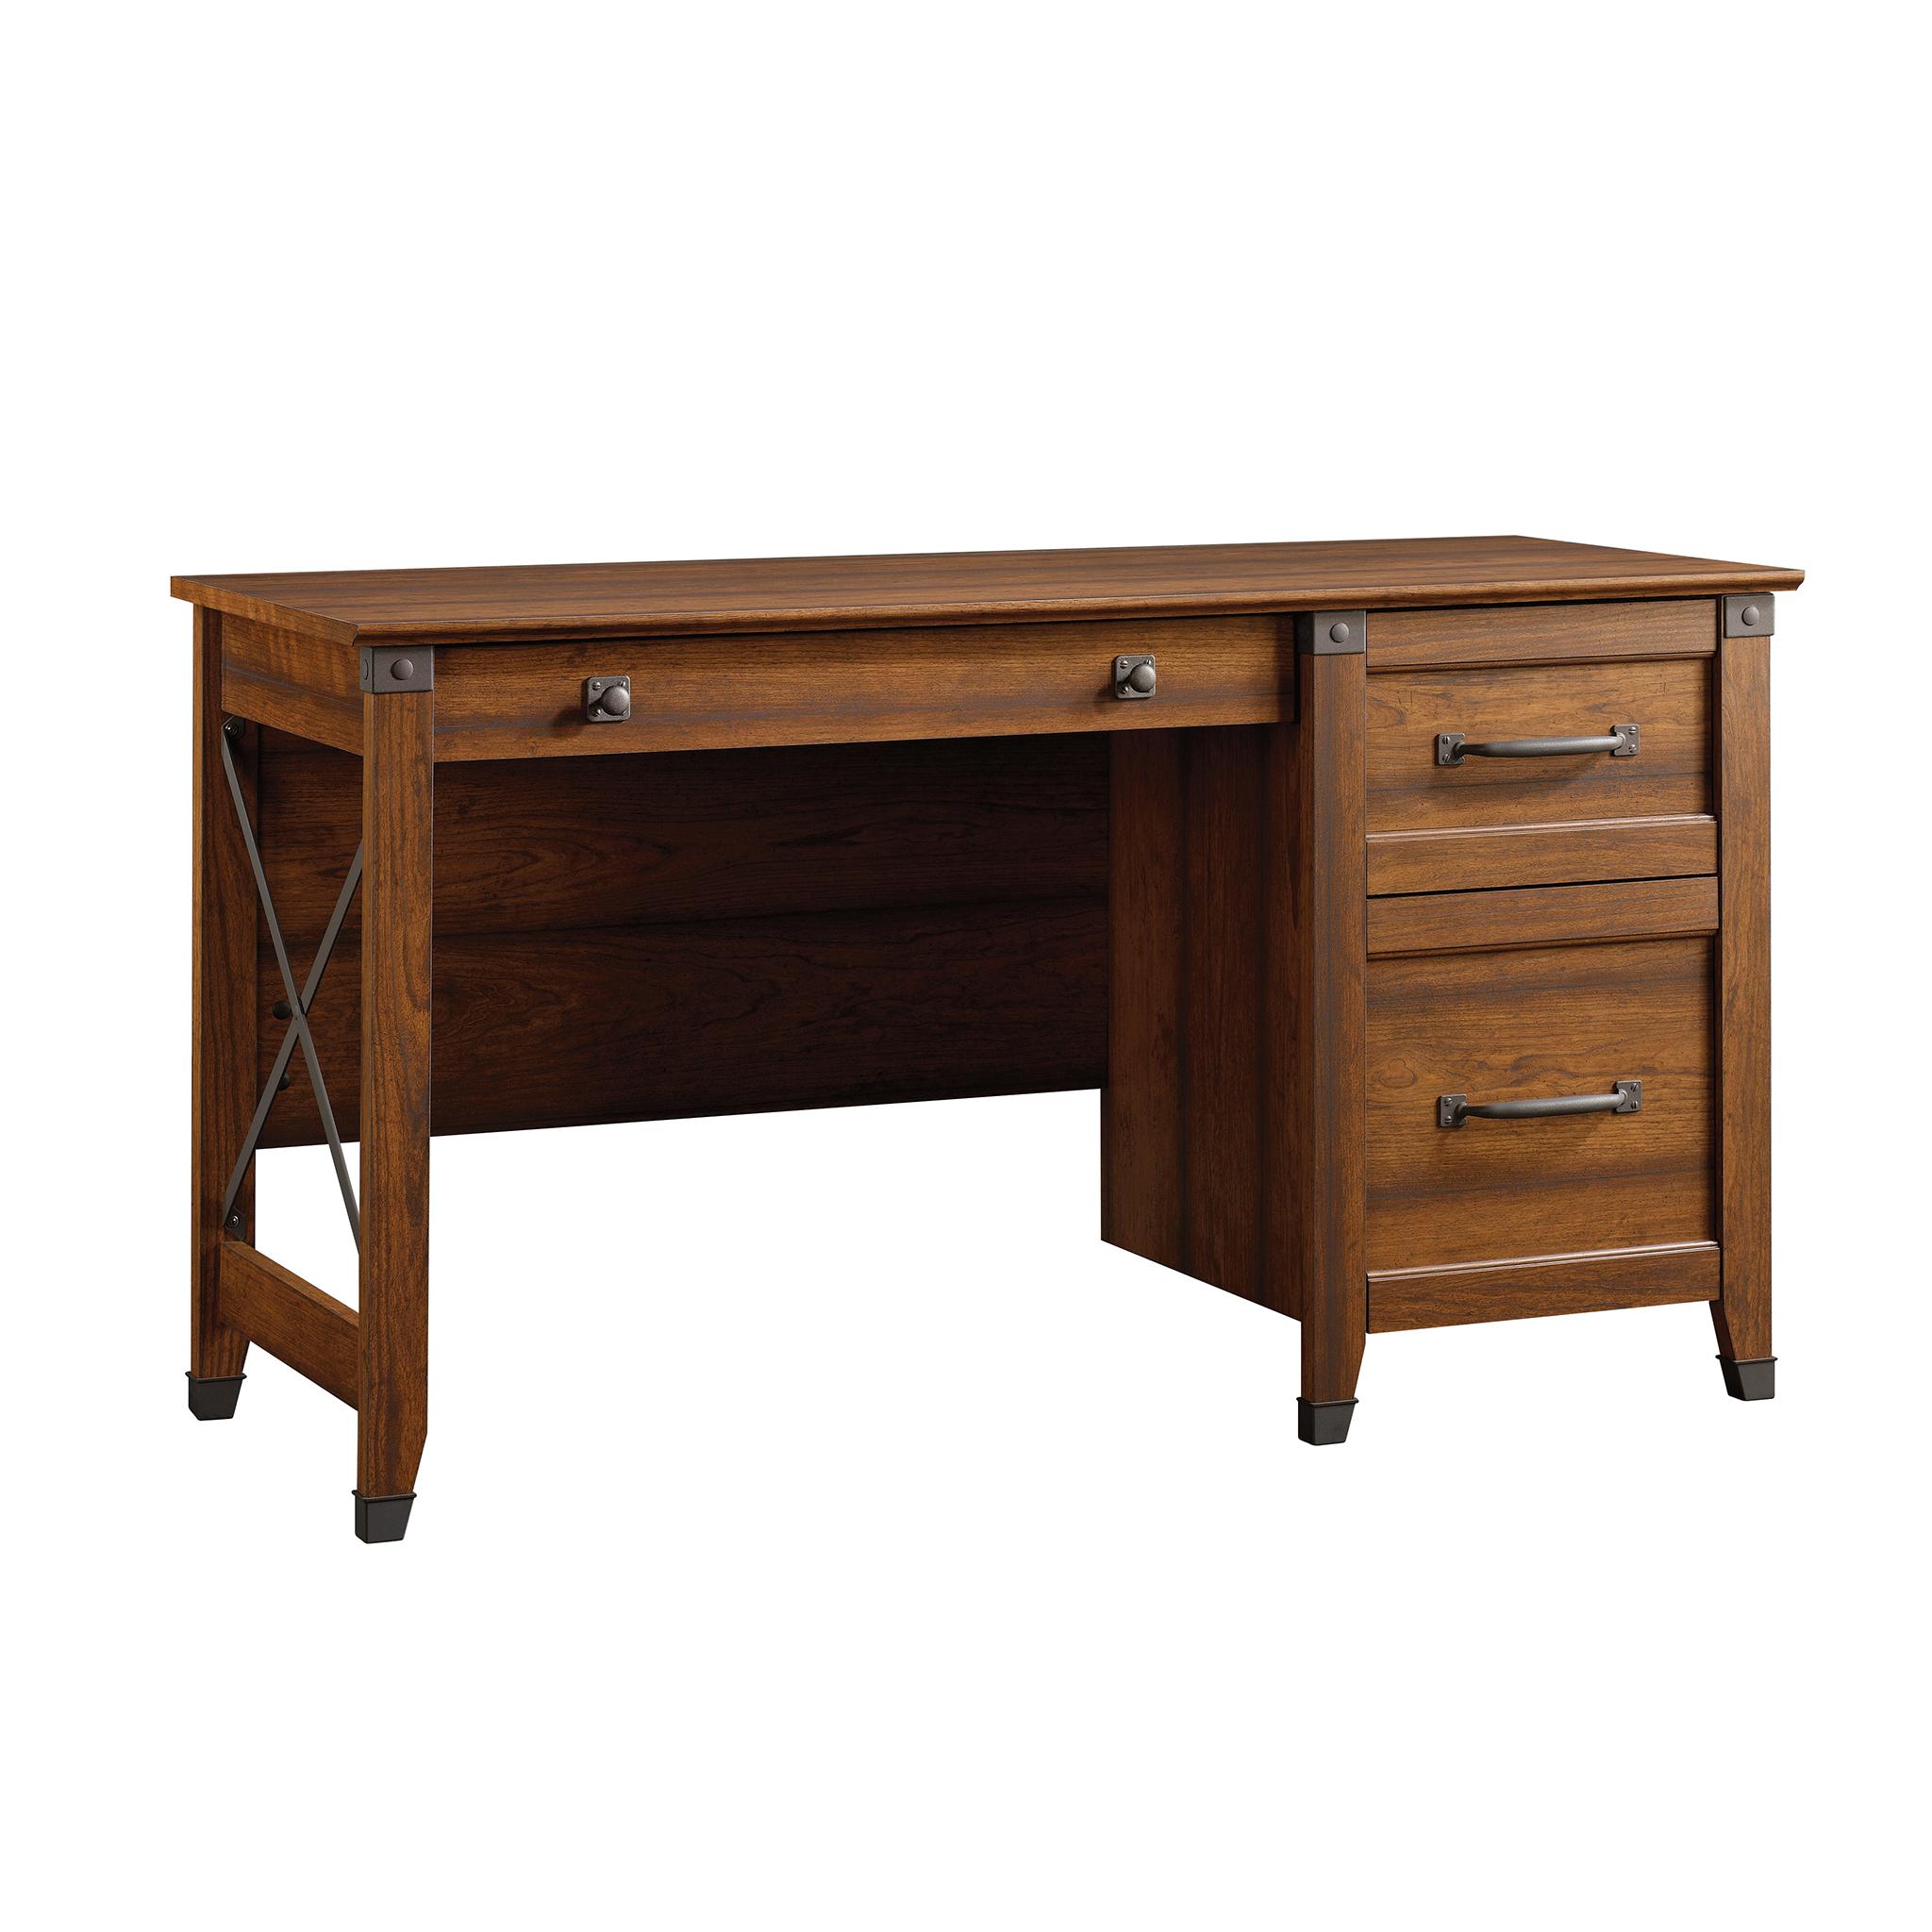 Sauder Carson Forge Desk With 3 Drawers Washington Cherry Walmart Com